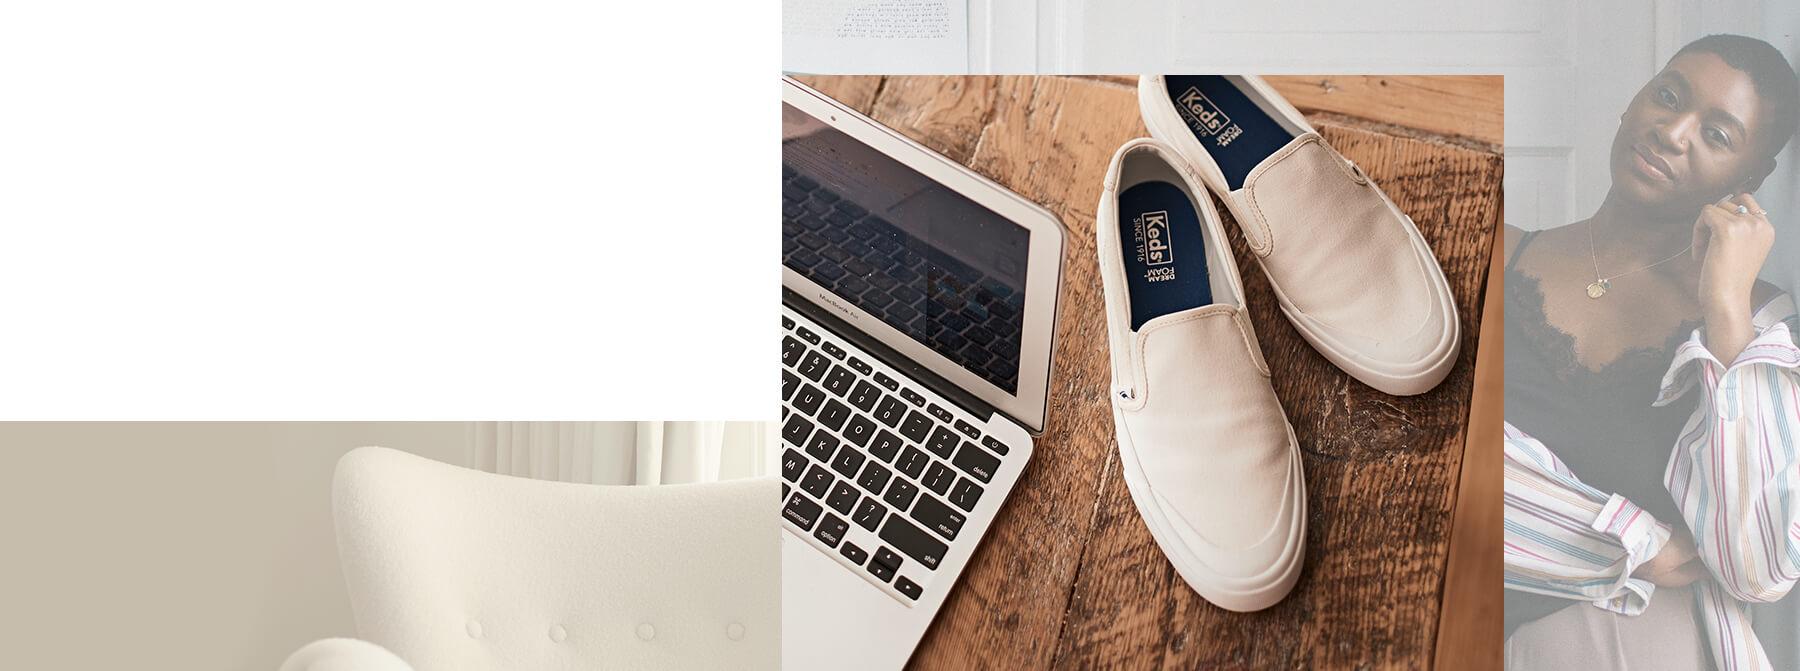 Keds. Comfortable shoes next to a laptop.